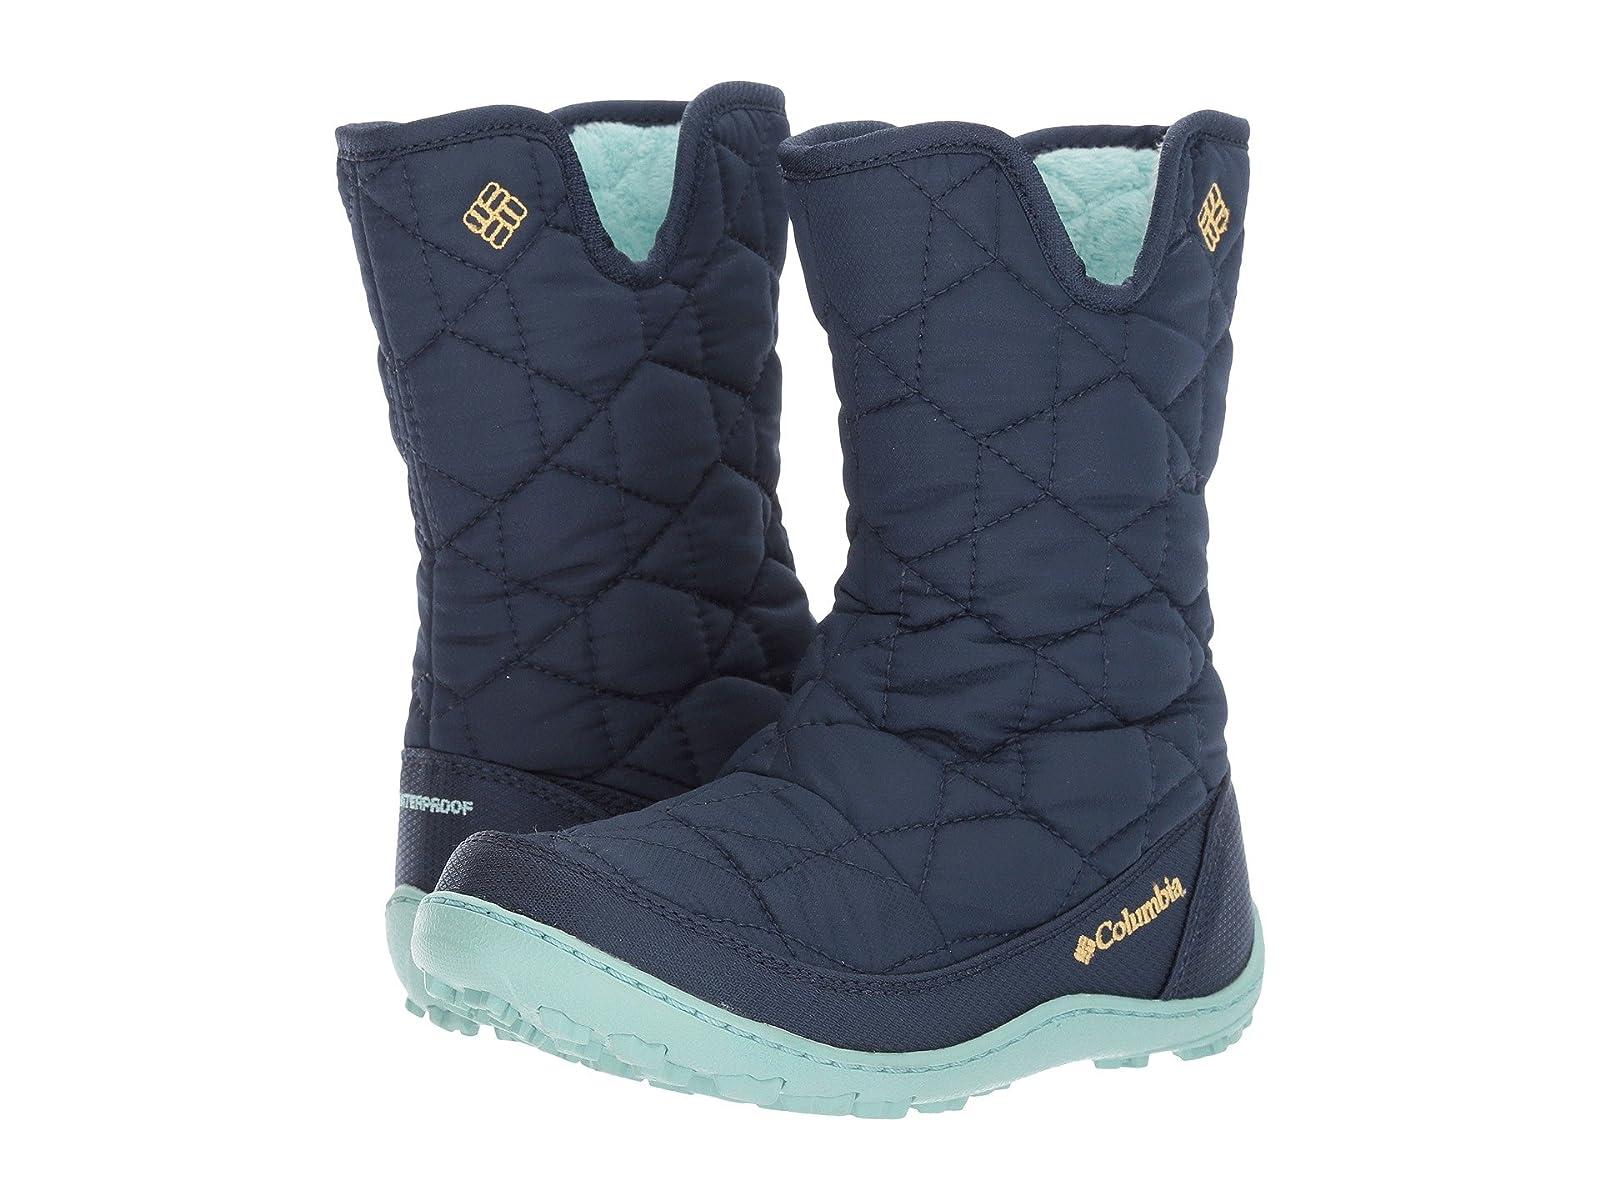 Columbia Kids Minx™ Slip Omni-Heat™ Waterproof Boot (Little Kid/Big Kid)Cheap and distinctive eye-catching shoes